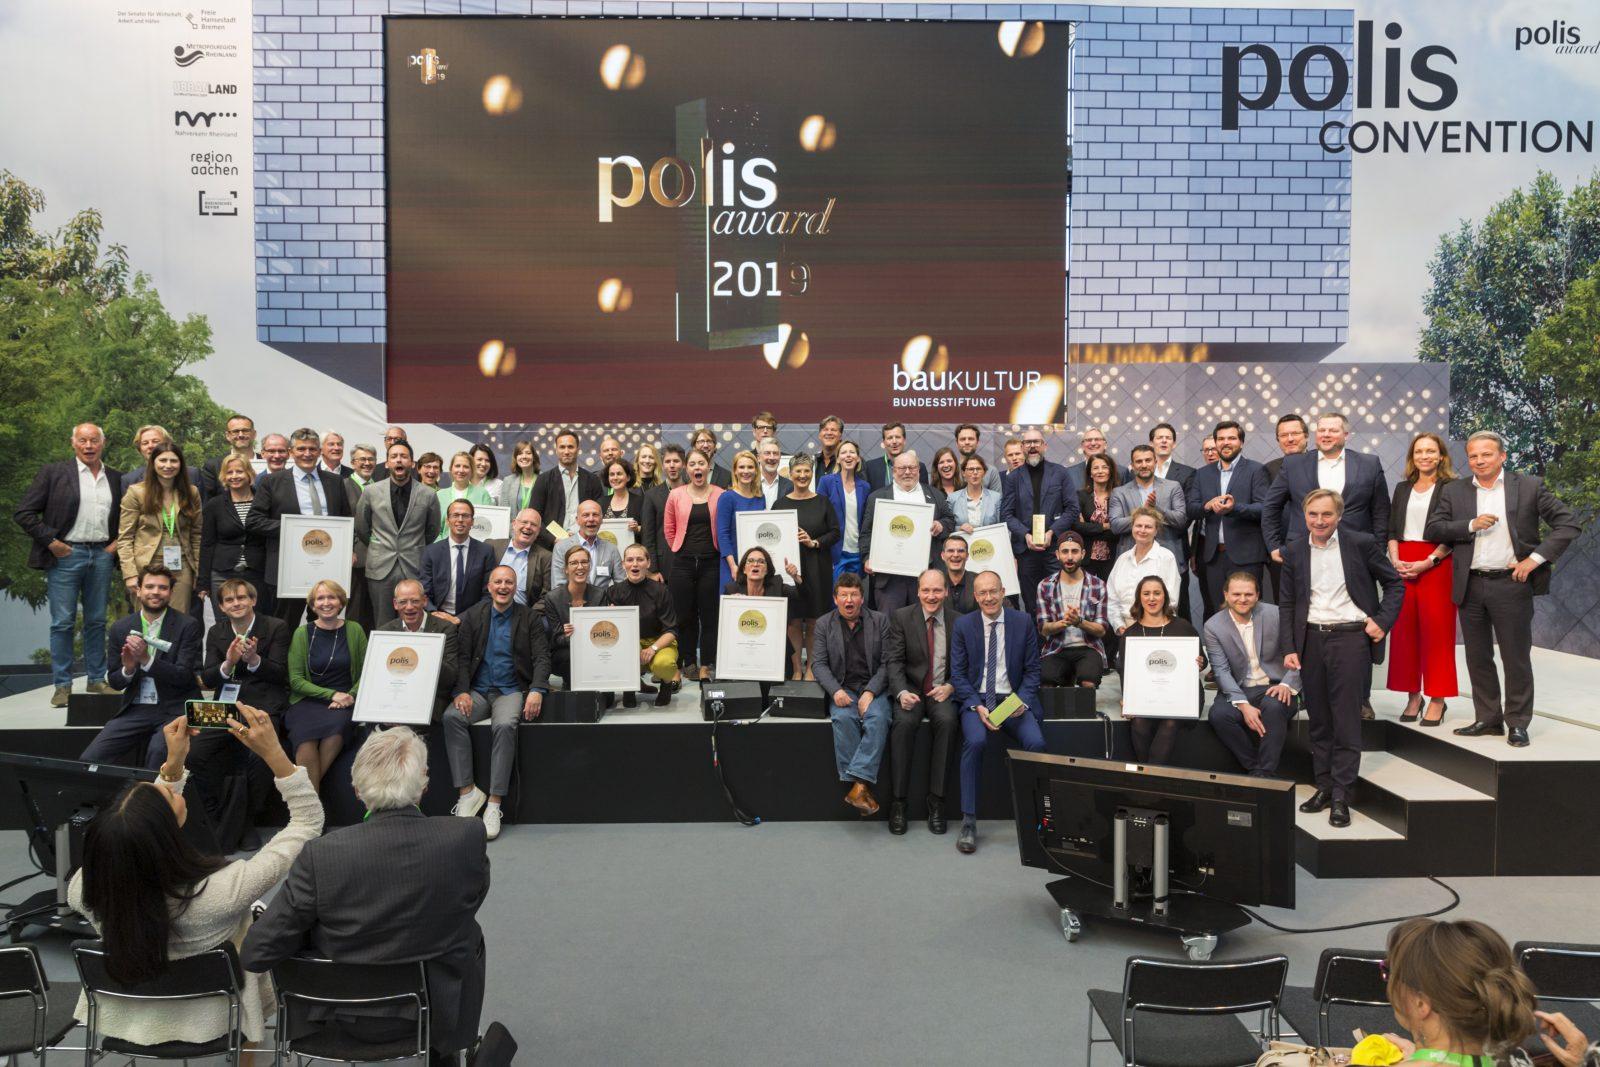 Foto: Sascha Kreklau / polis Convention